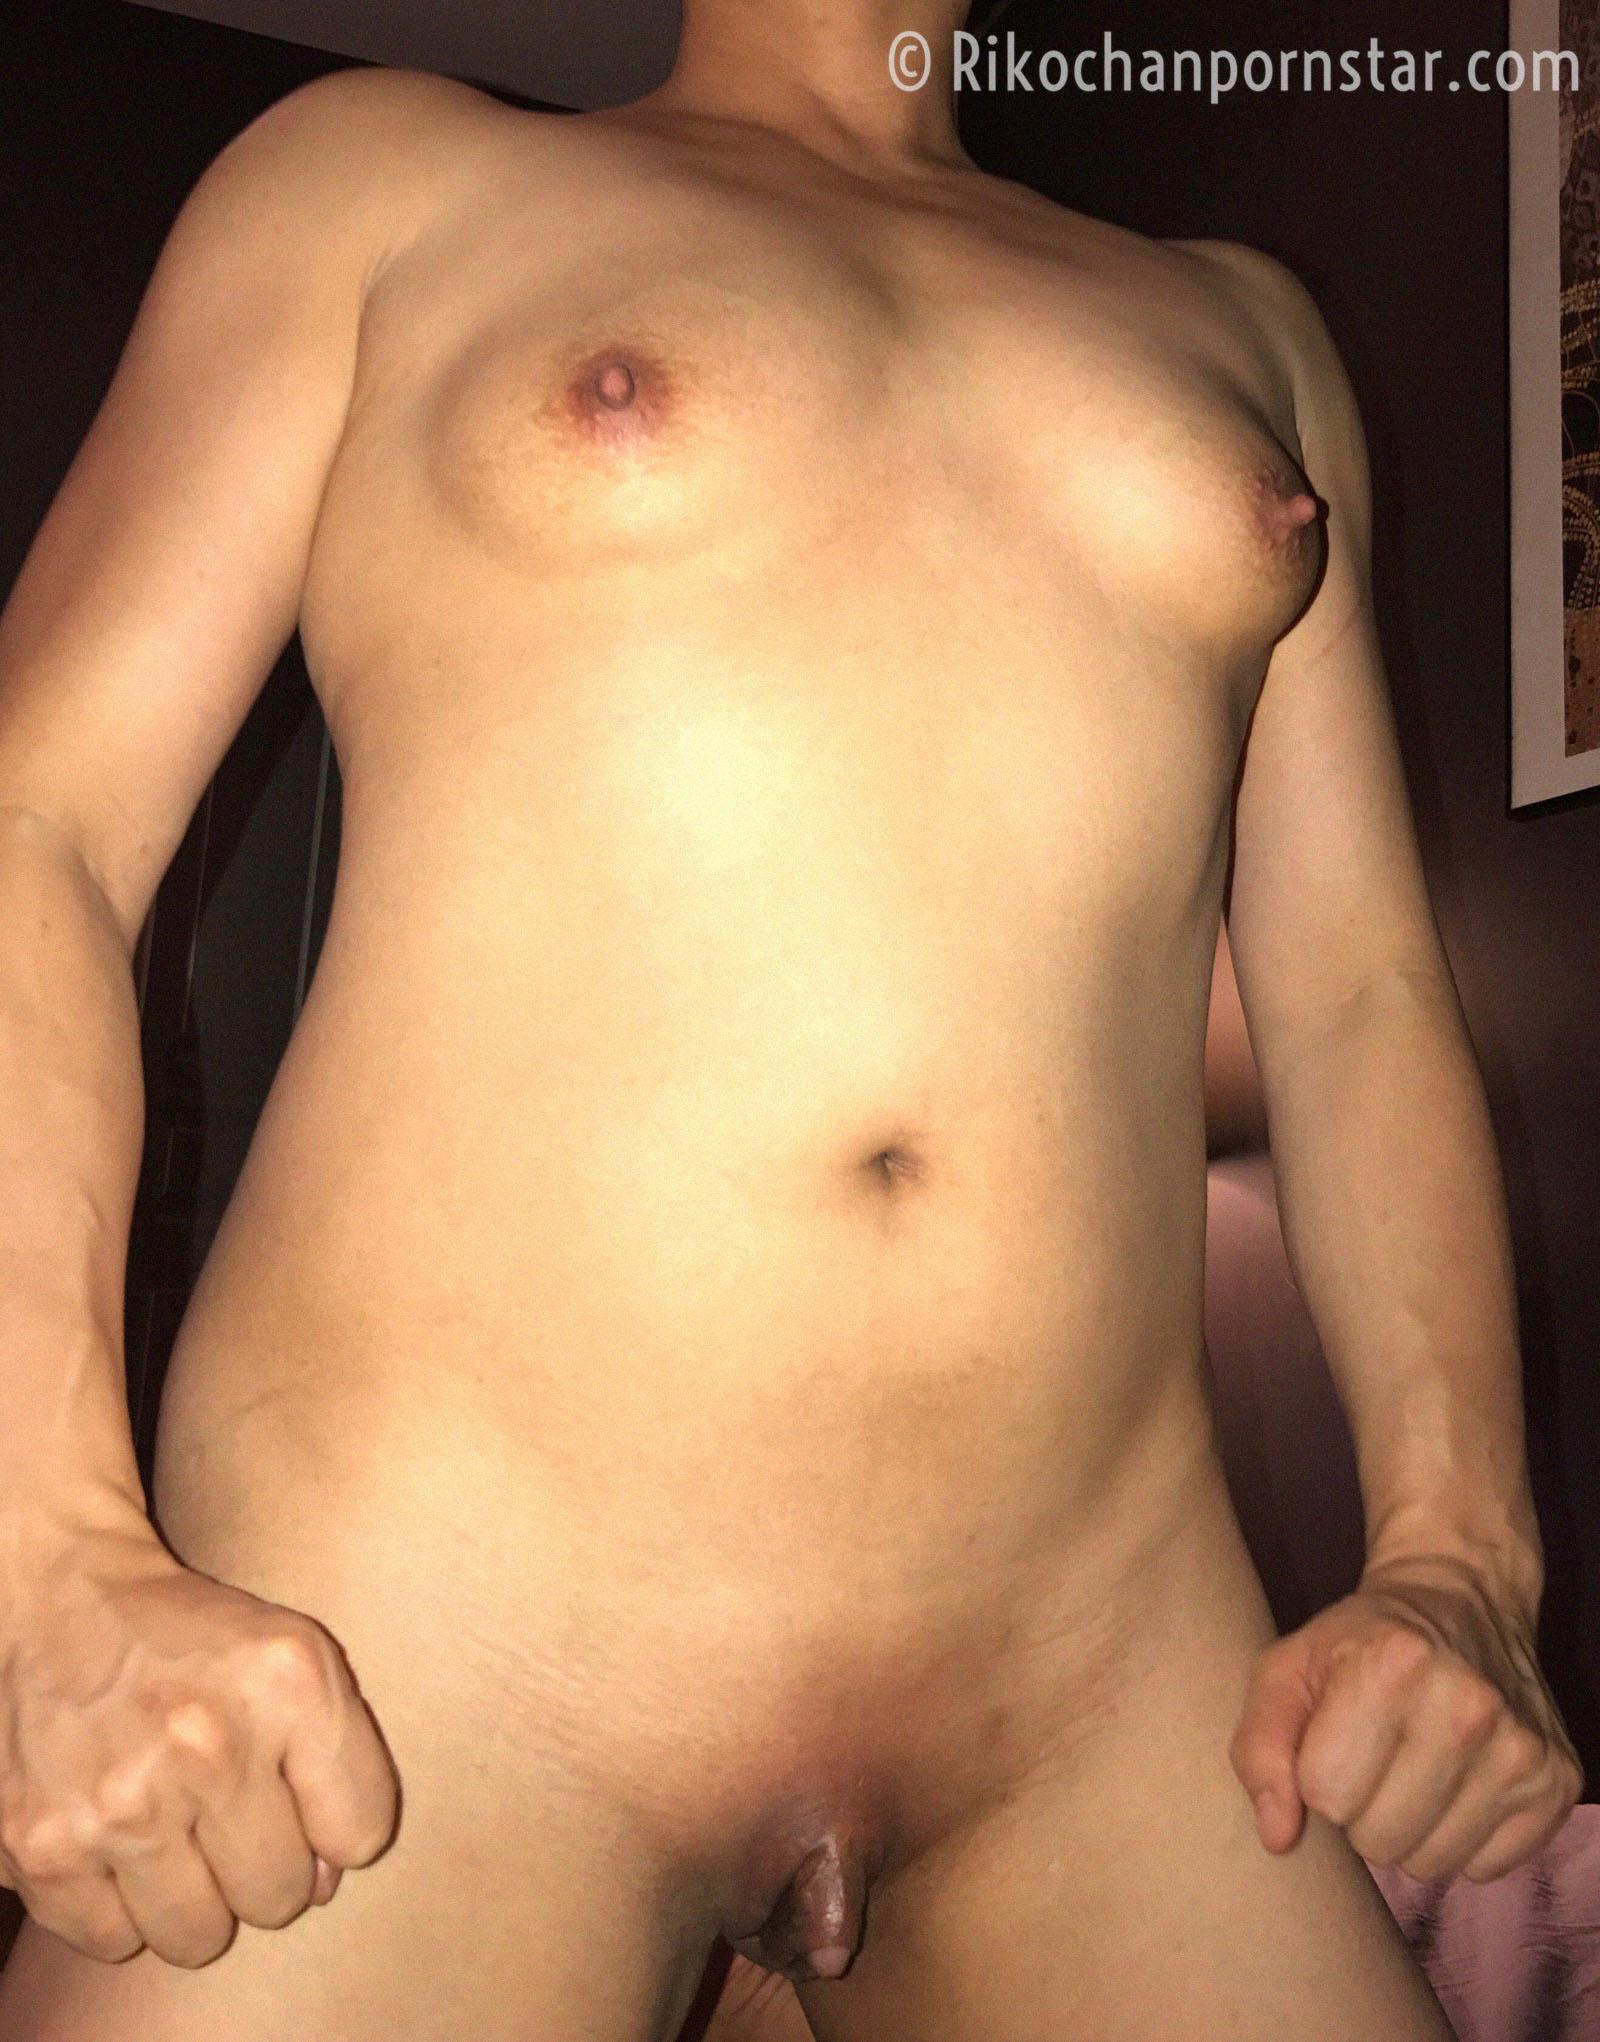 Huge Nipples And Clits Classy mistress treasure archives | rikochan!